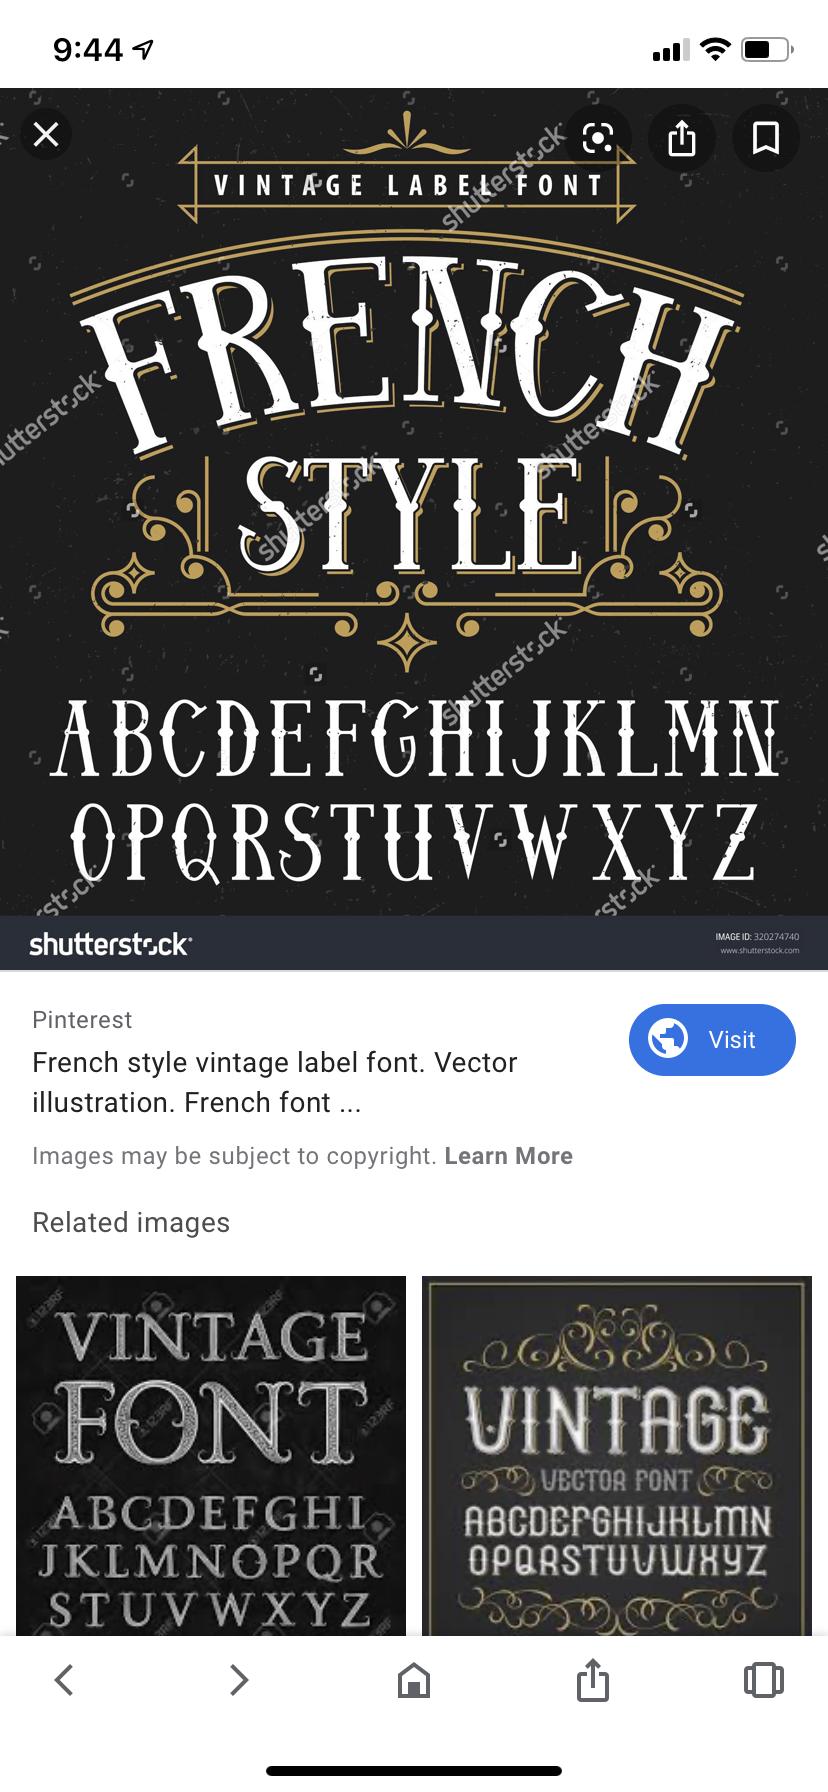 Pin By Bonnie Bjorem On French Script Fonts Frames Vintage Labels French Font French Script Fonts